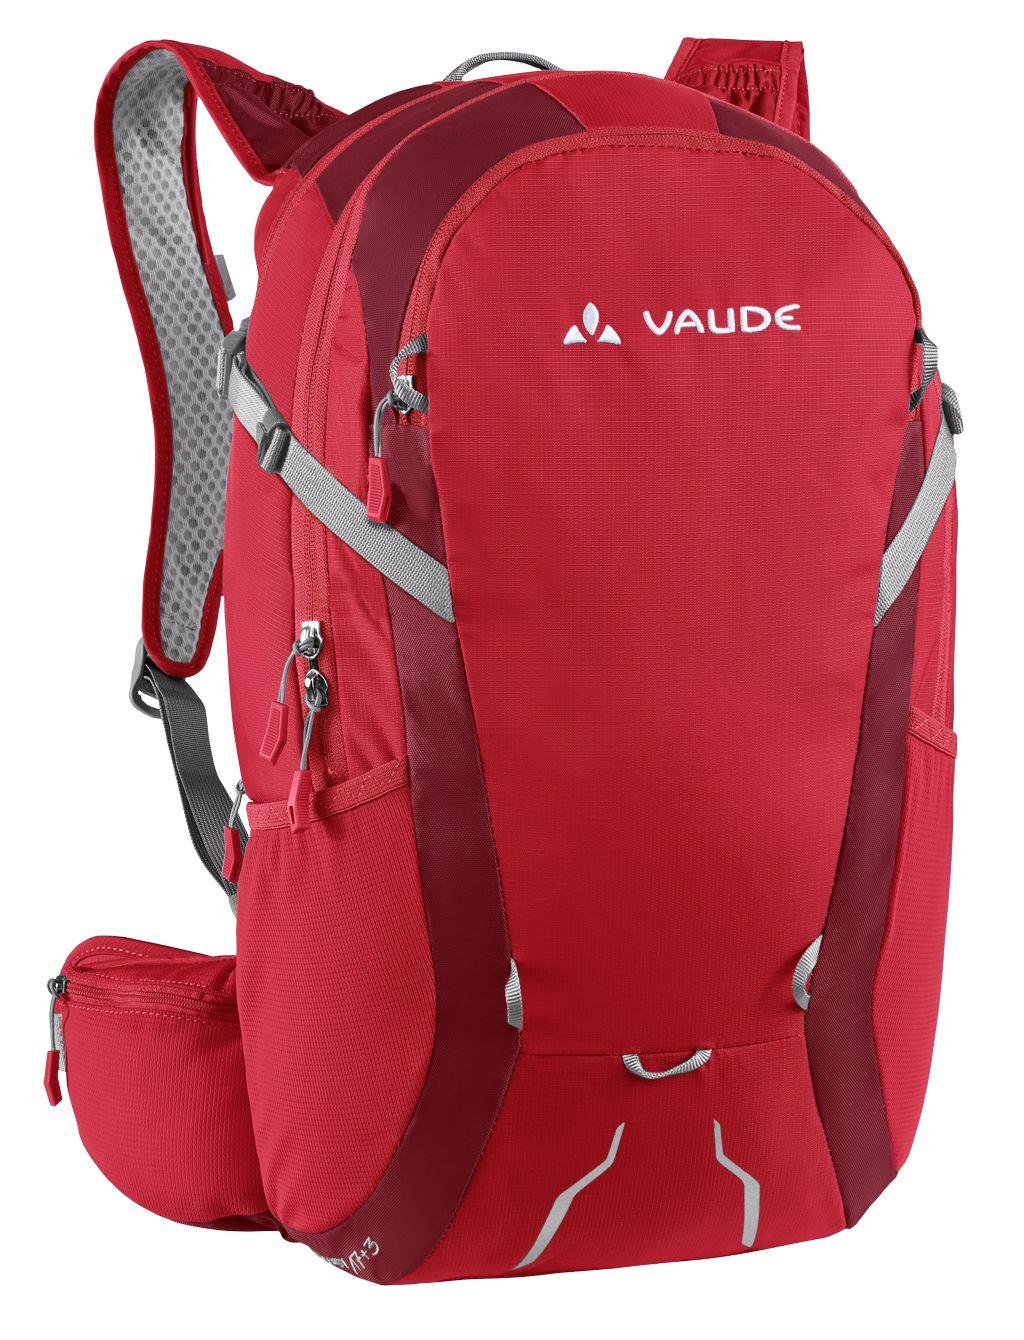 Vaude Roomy 17+3 red/salsa 117072060